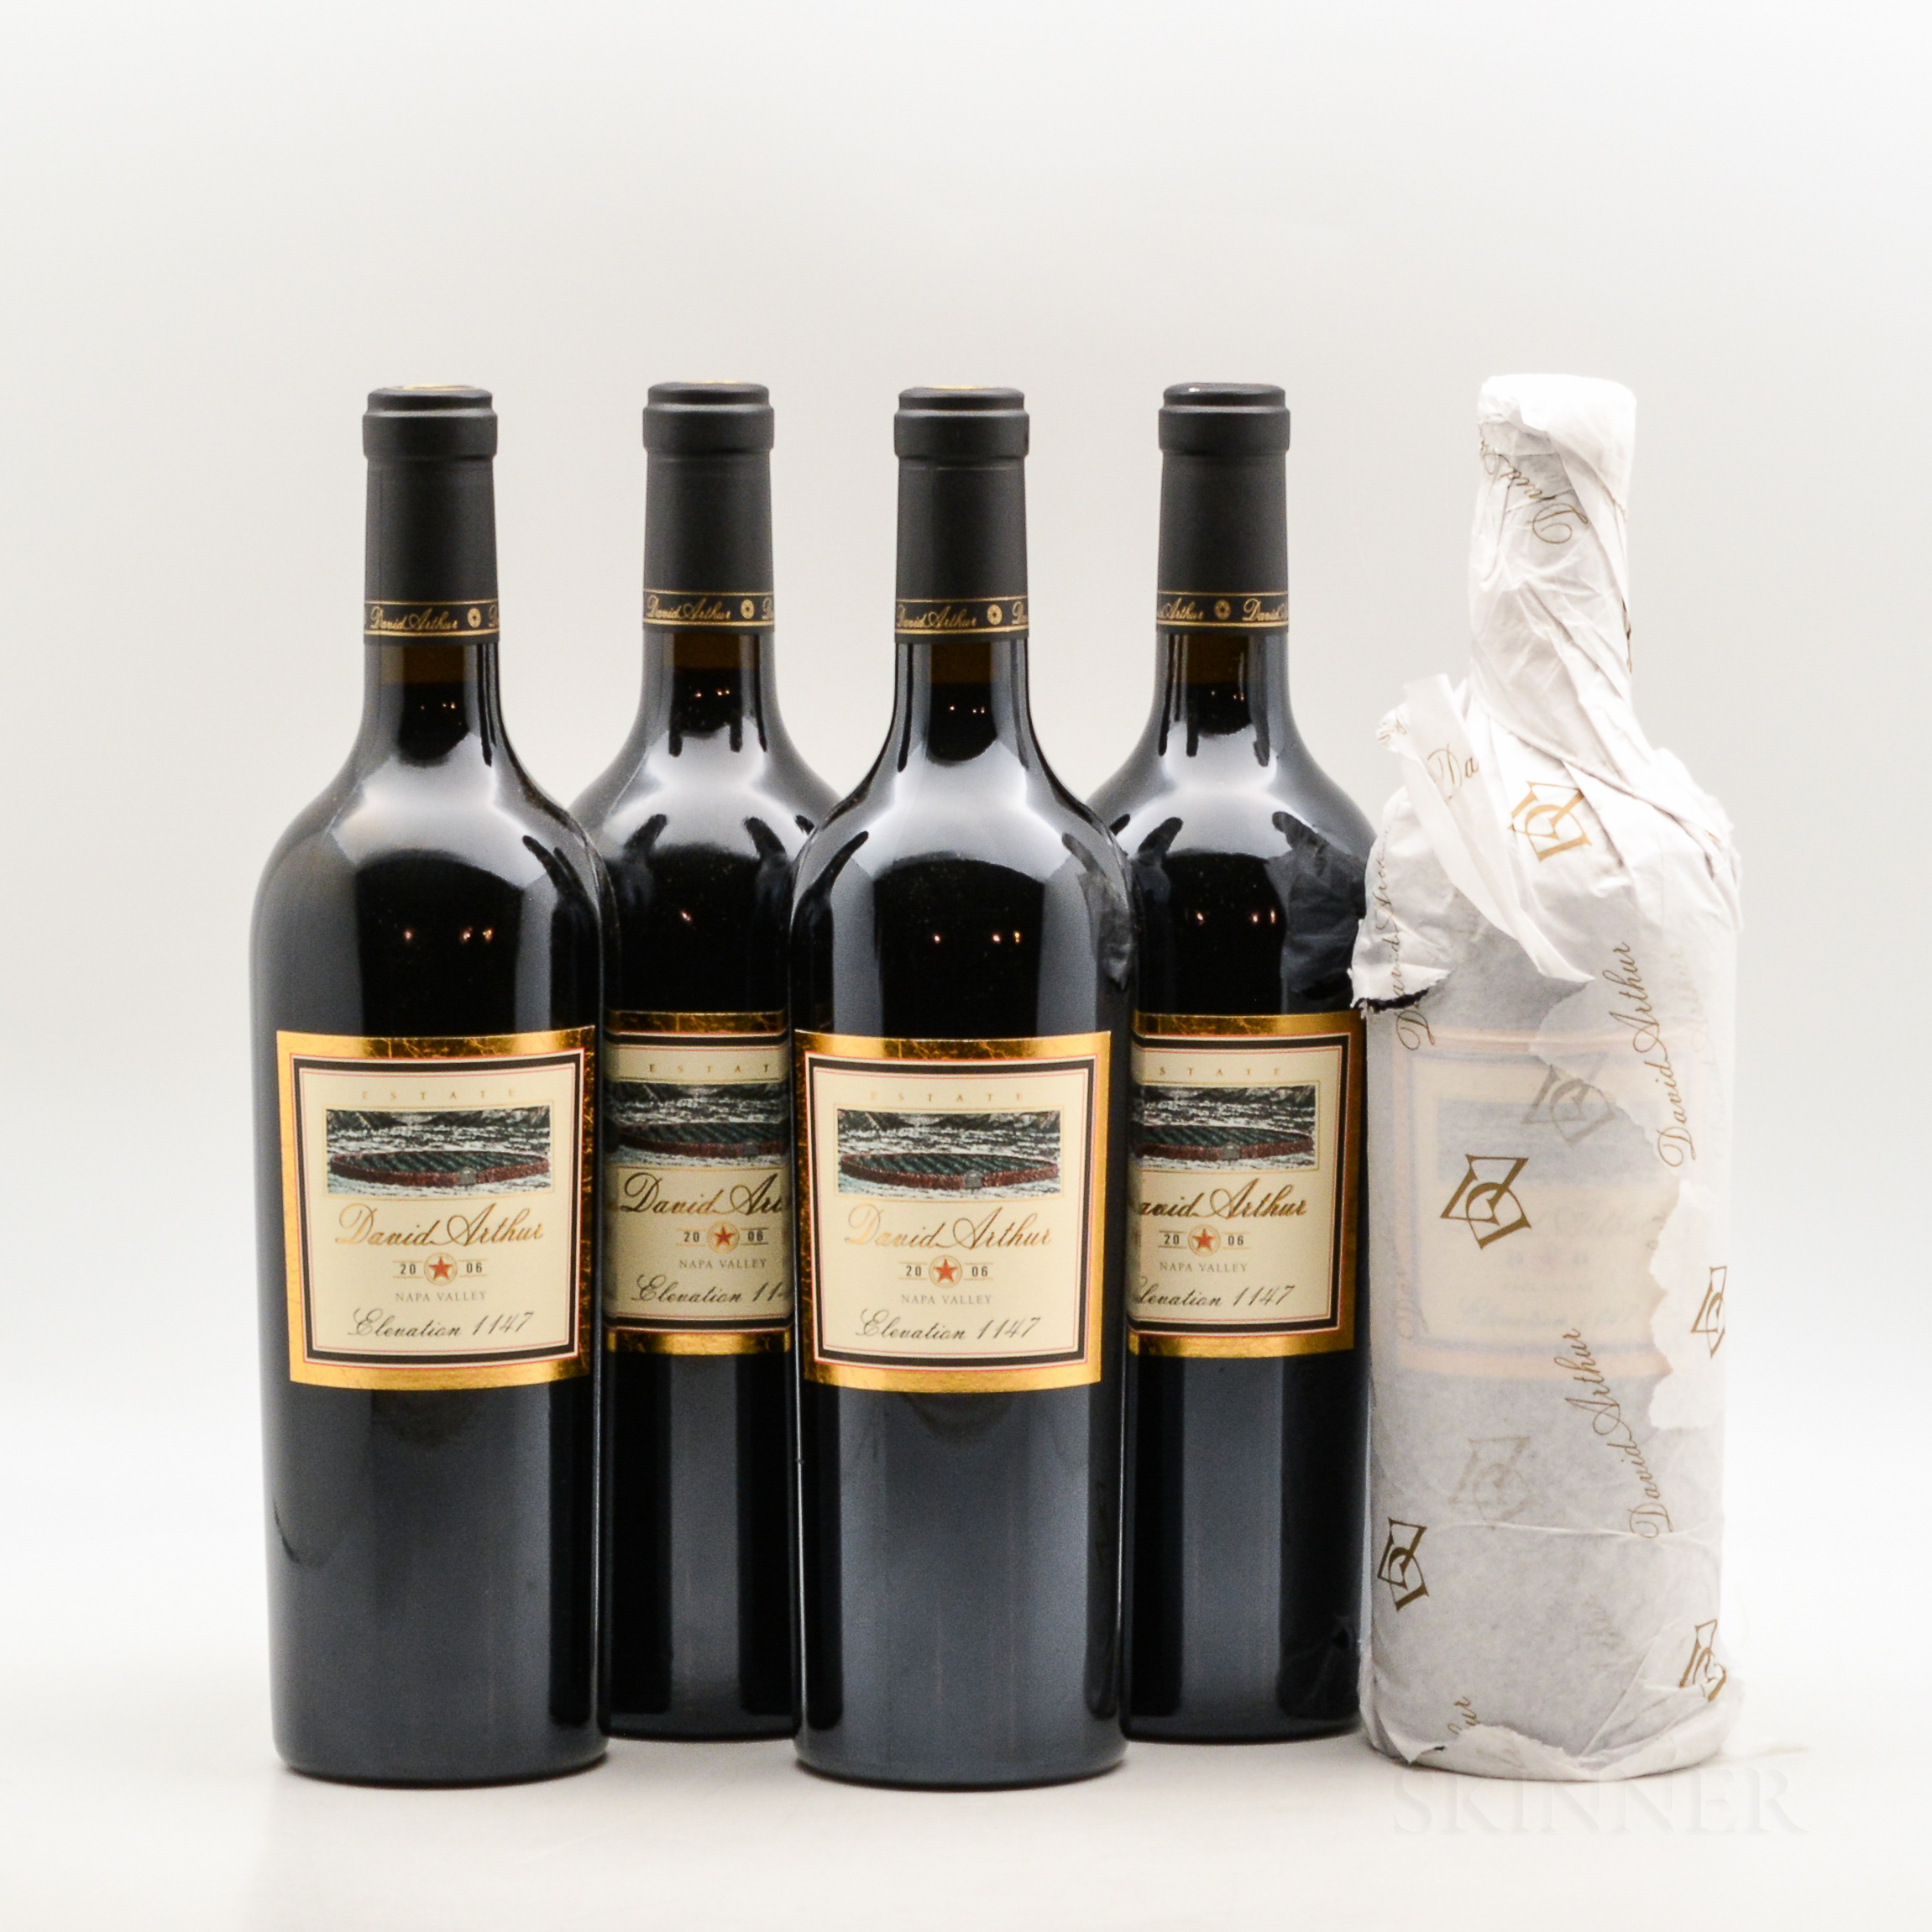 David Arthur Cabernet Sauvignon Elevation 1147 2006, 5 bottles